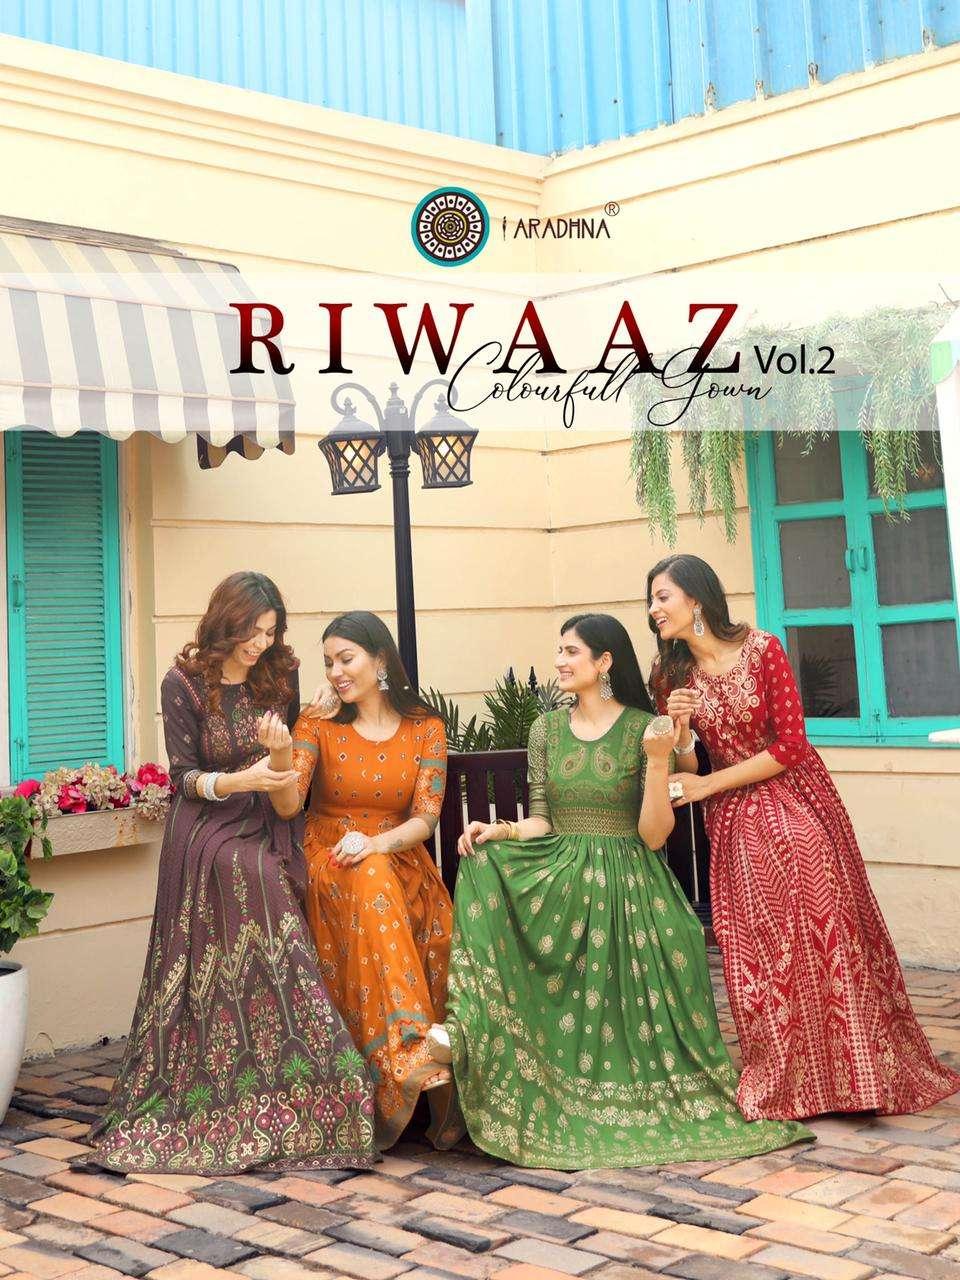 Aradhna Fashion Riwaaz Vol 2 heavy Rayon Long Anarkali Style Kurtis collection